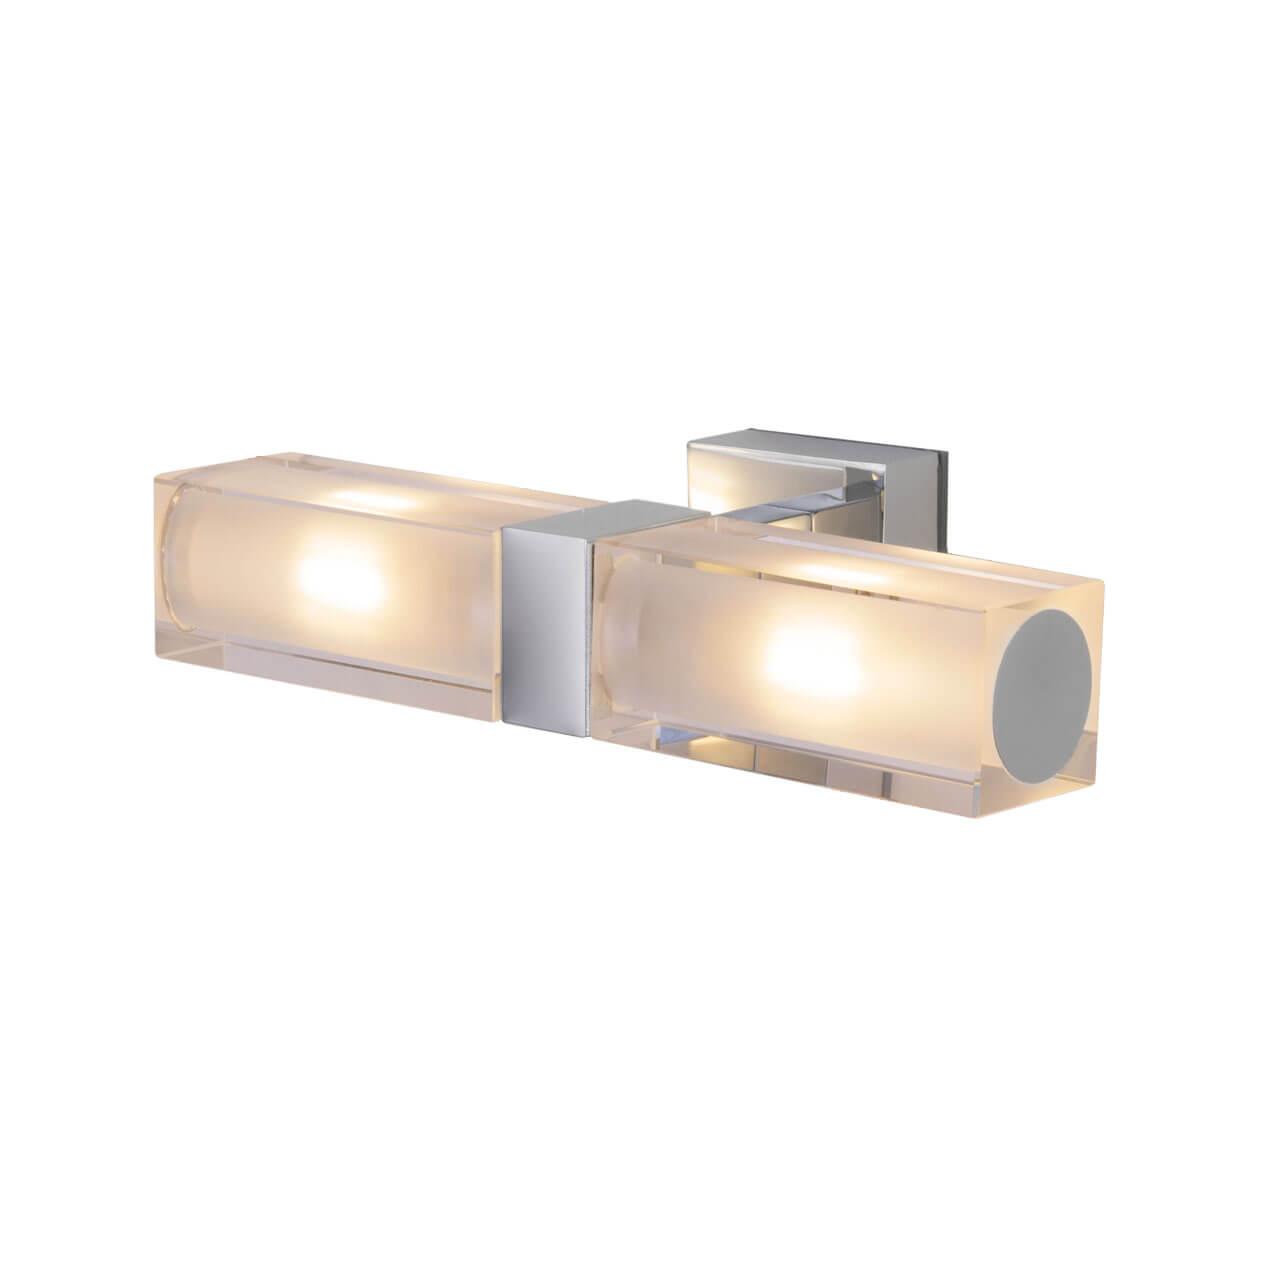 Подсветка для зеркал Elektrostandard 4690389062001 Duplex duplex